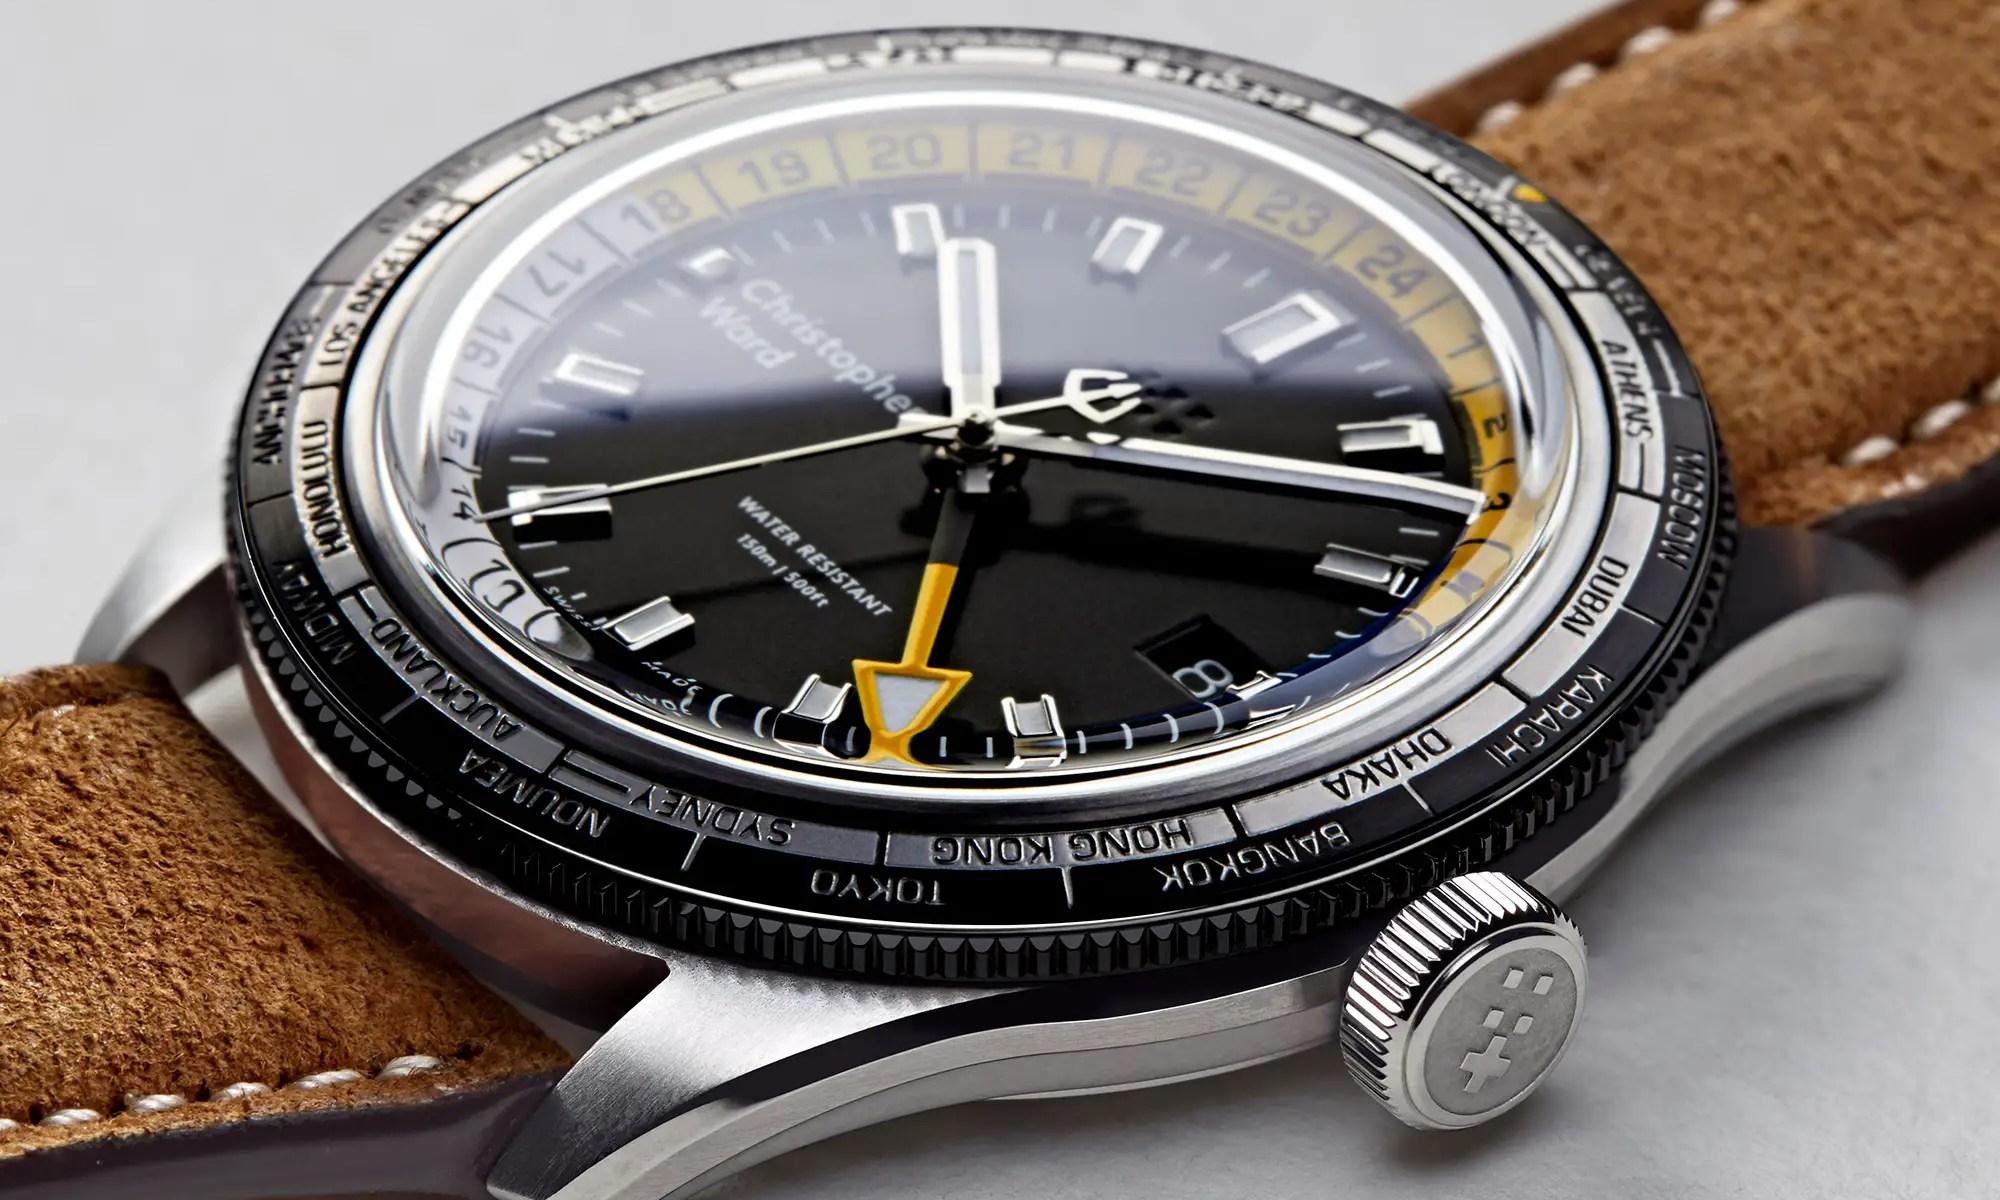 C65 GMT Worldtimer Www.christopherward.co 26